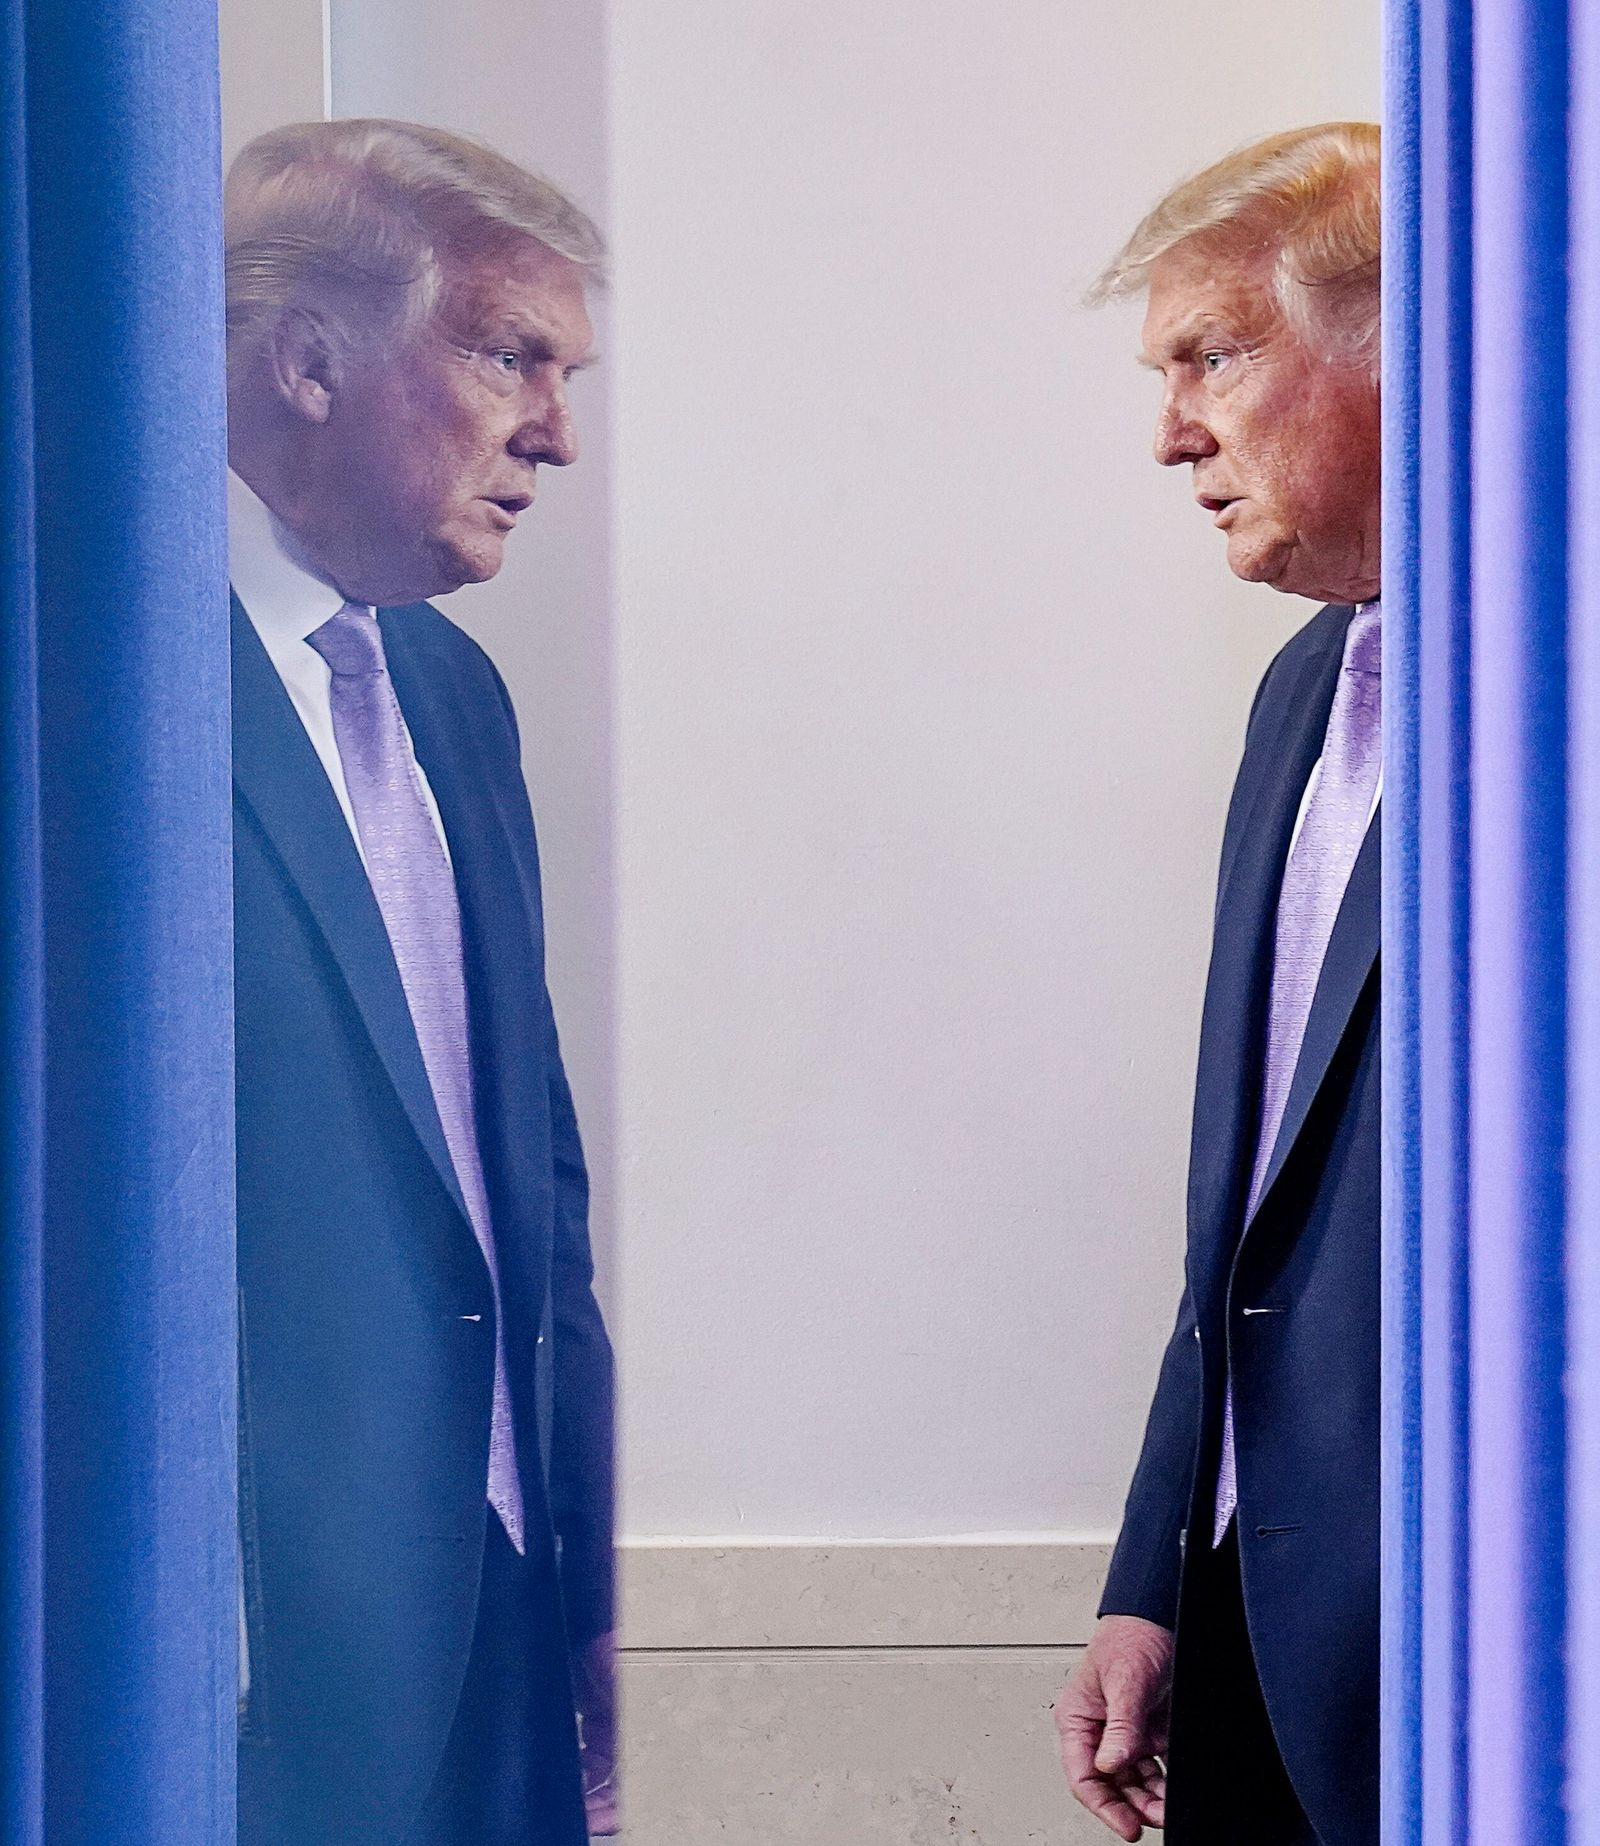 U.S. President Trump holds coronavirus disease (COVID-19) pandemic briefing at the White House in Washington